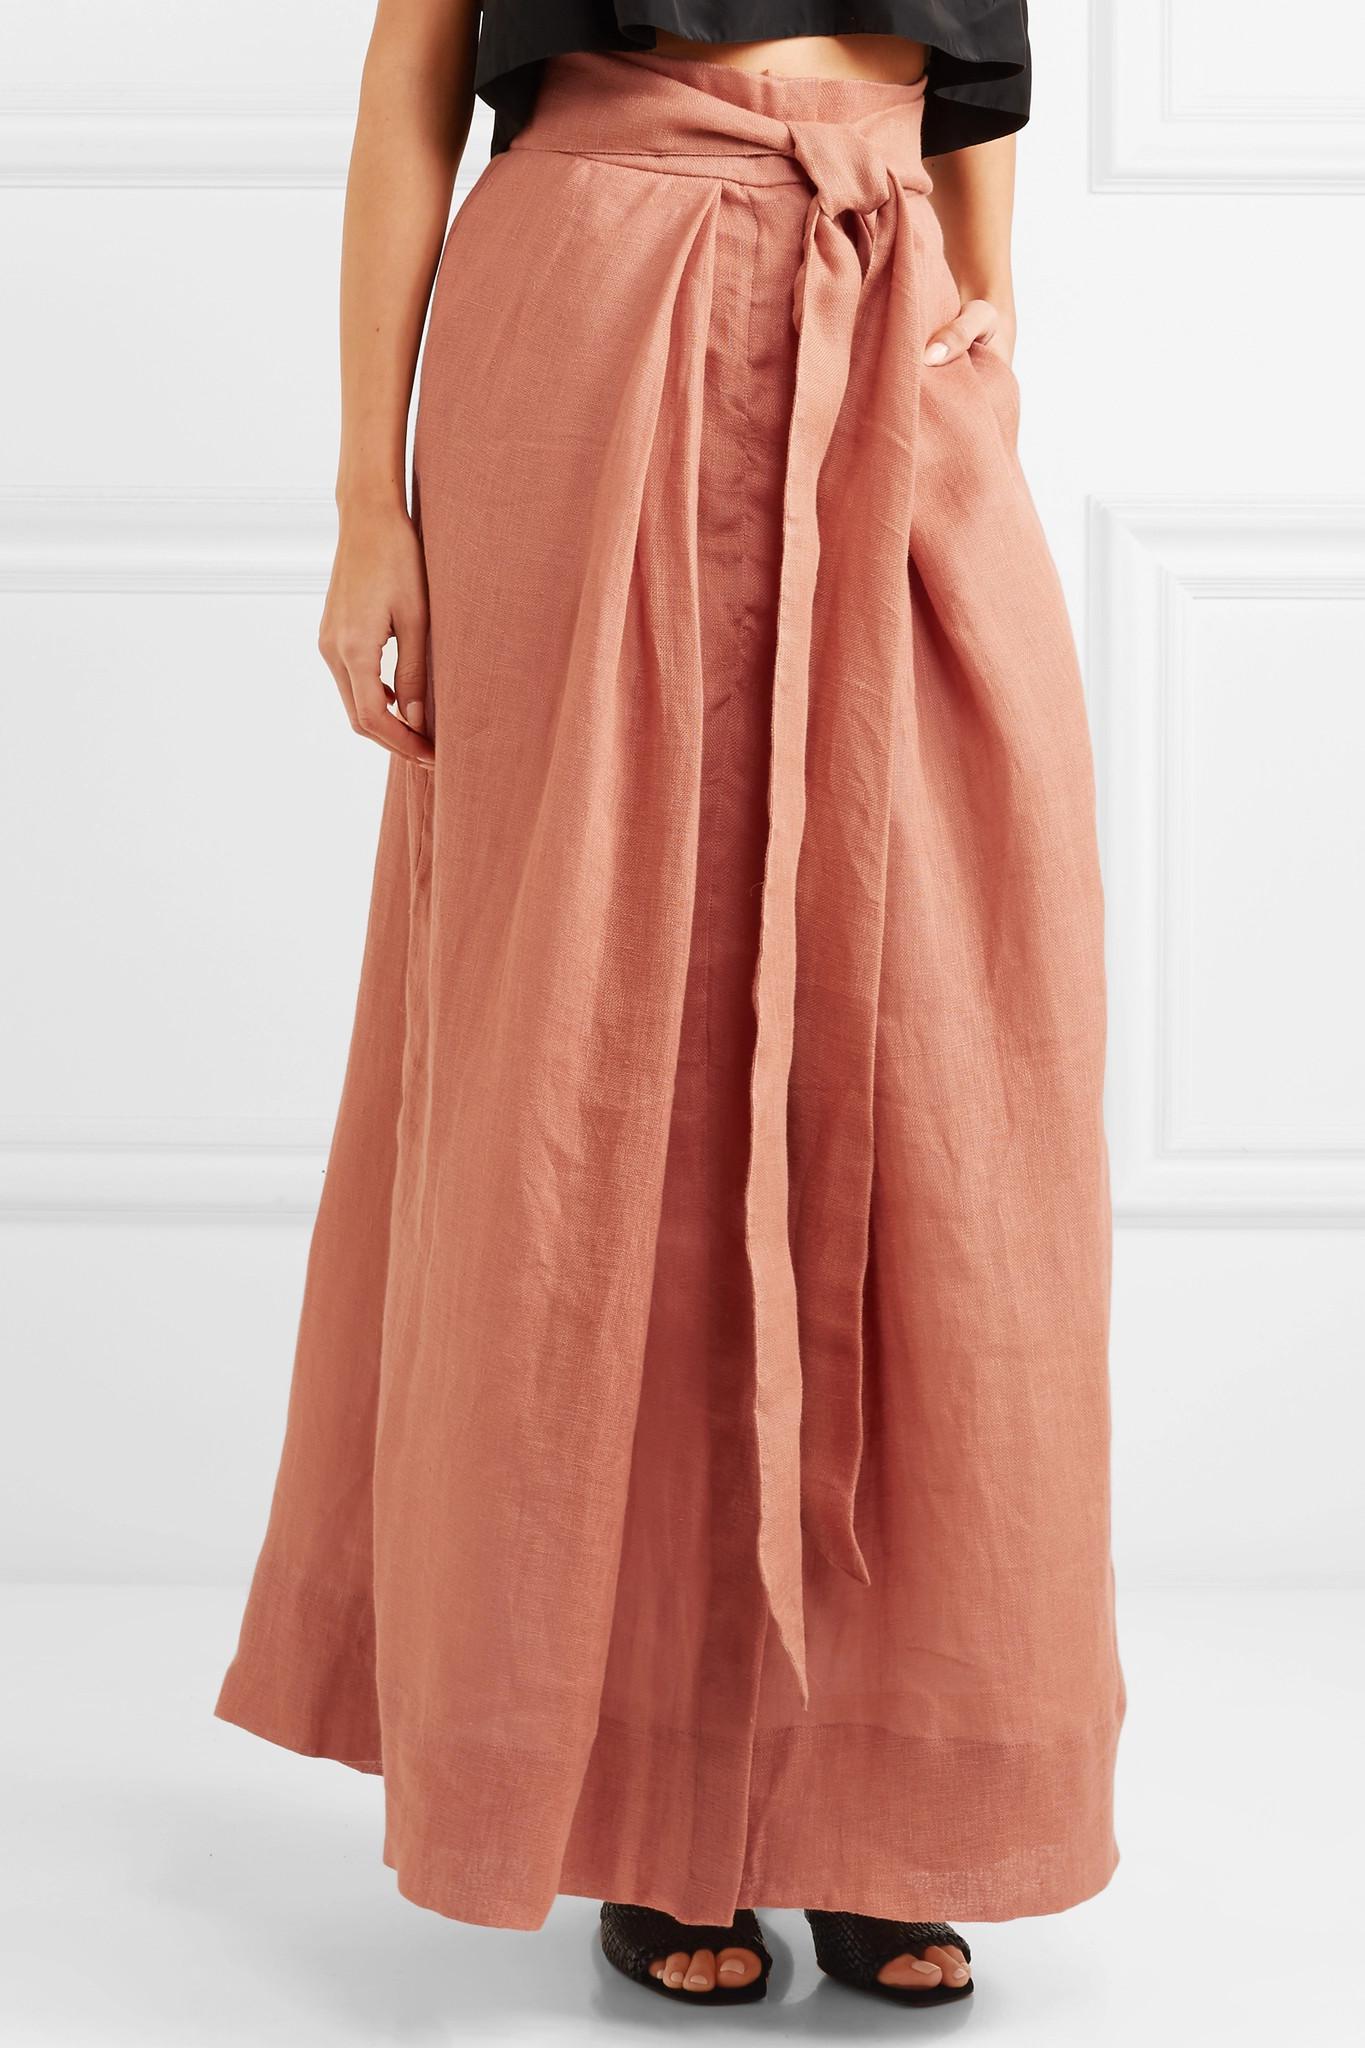 385edb180 Kalita Avedon Days Linen-canvas Maxi Skirt in Brown - Lyst